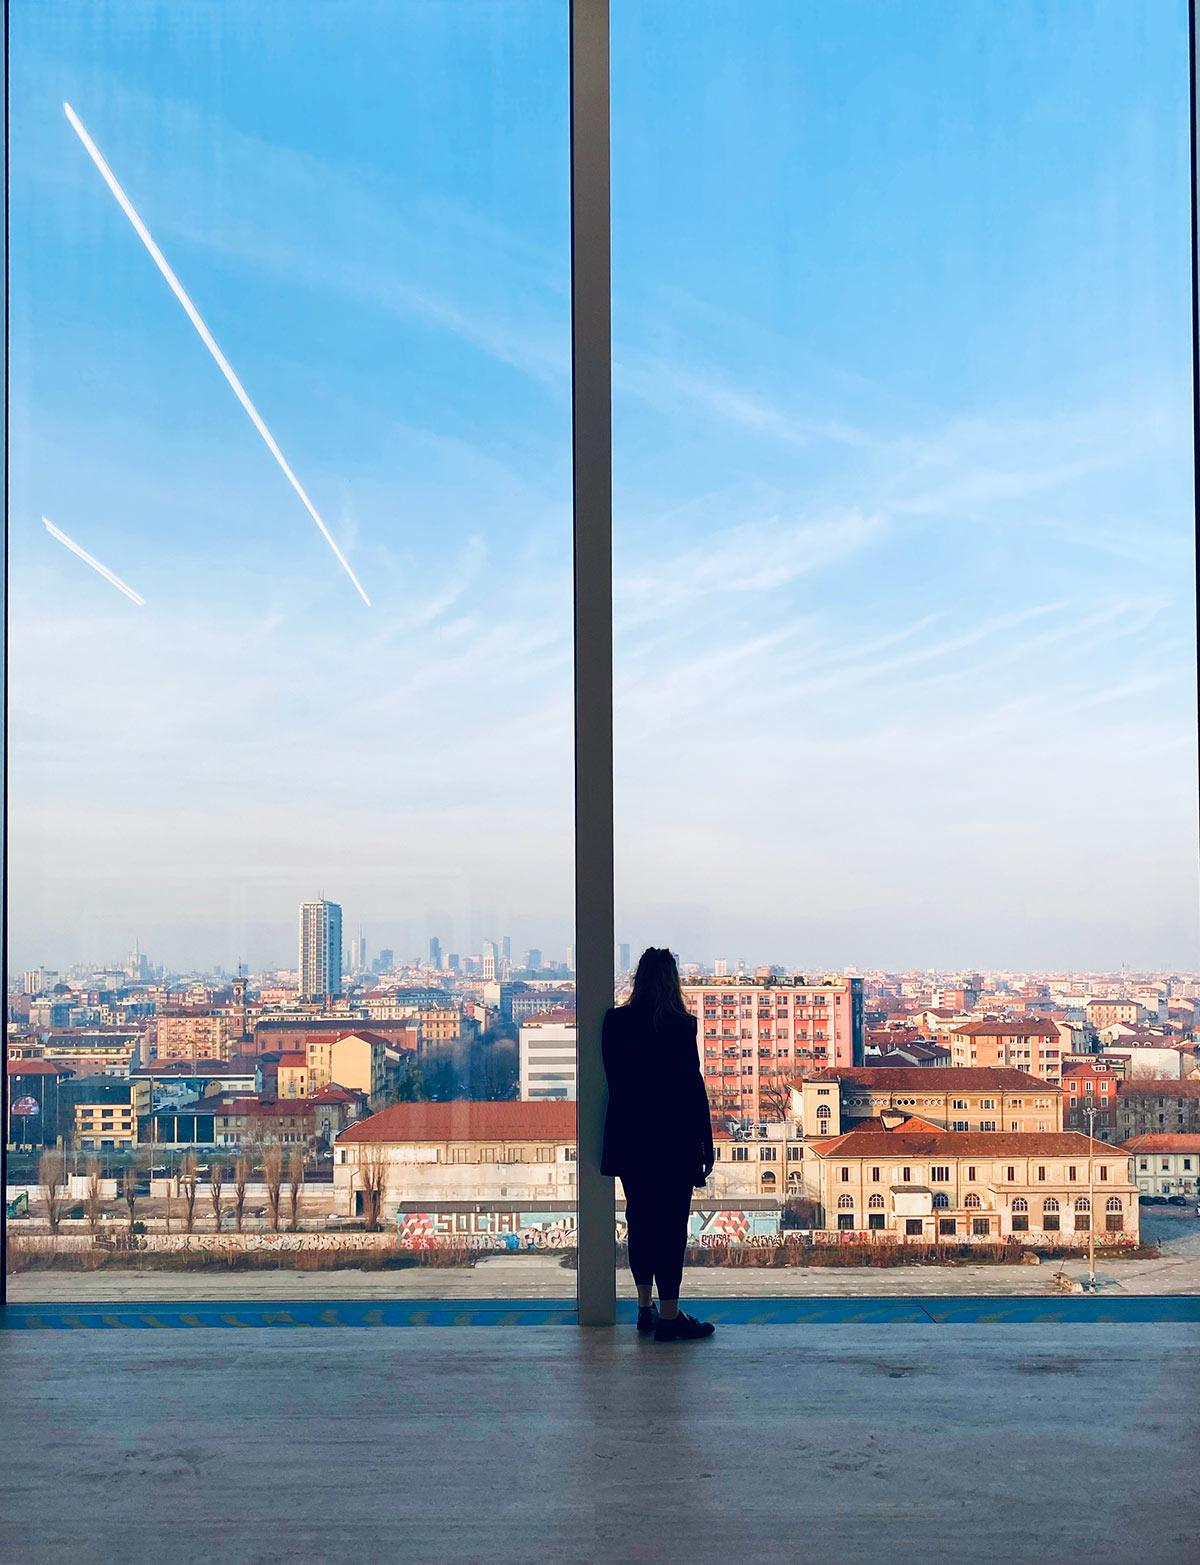 fondazione-prada-milano-panorama